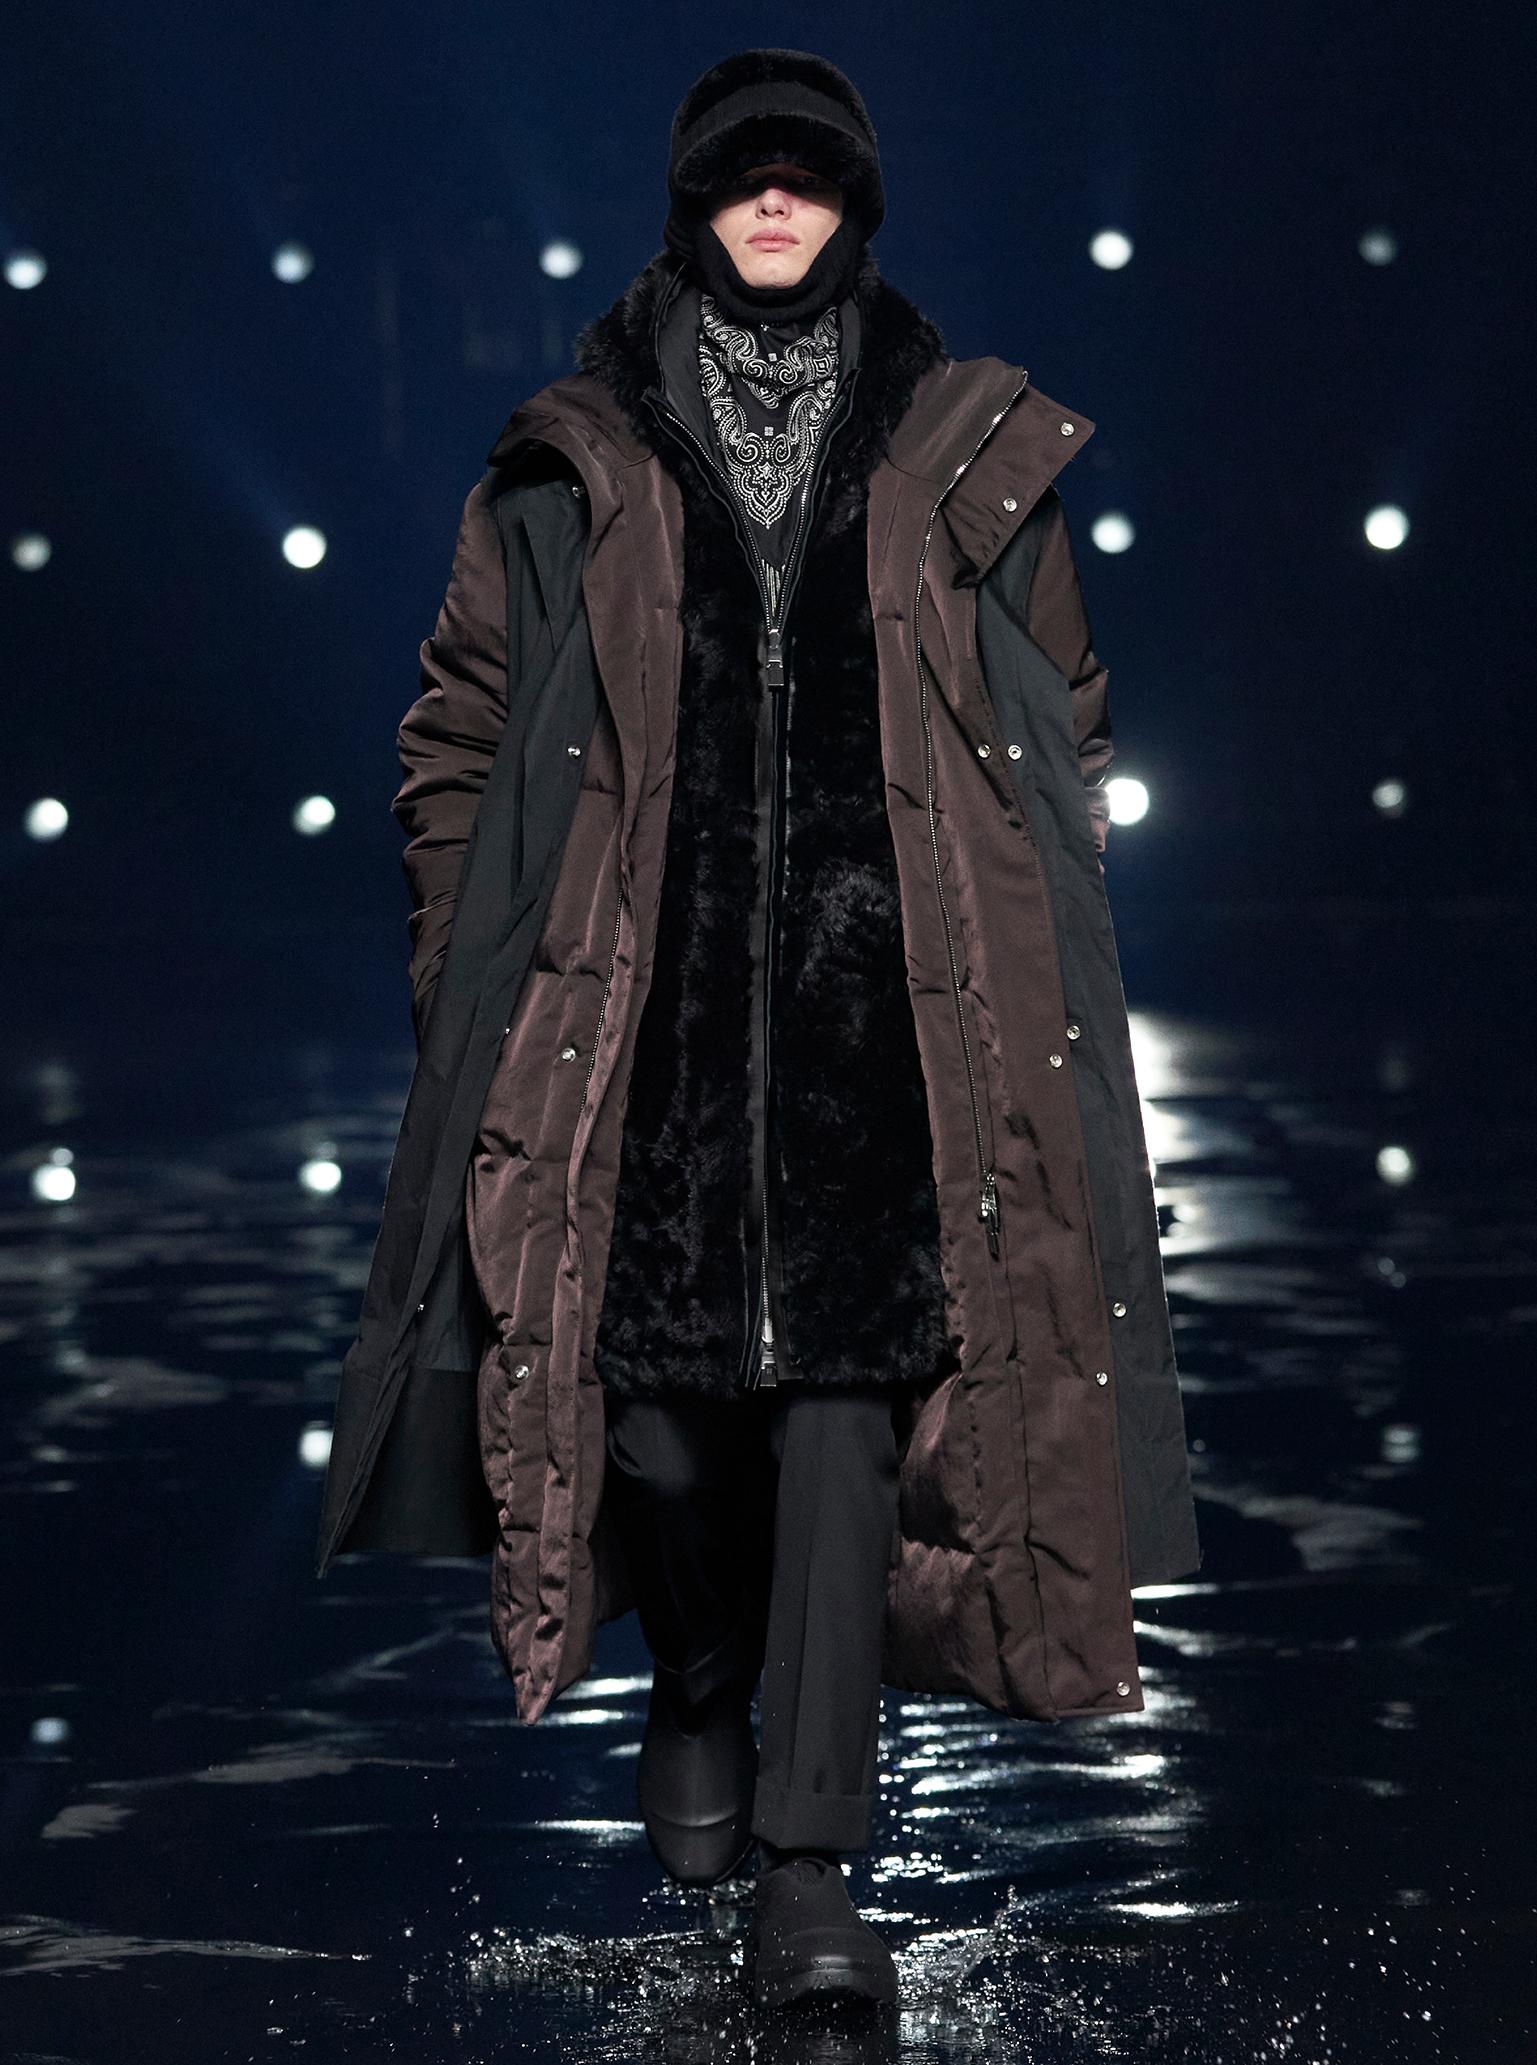 Givenchy Paris fashion week F/W 2021 oversized parkas